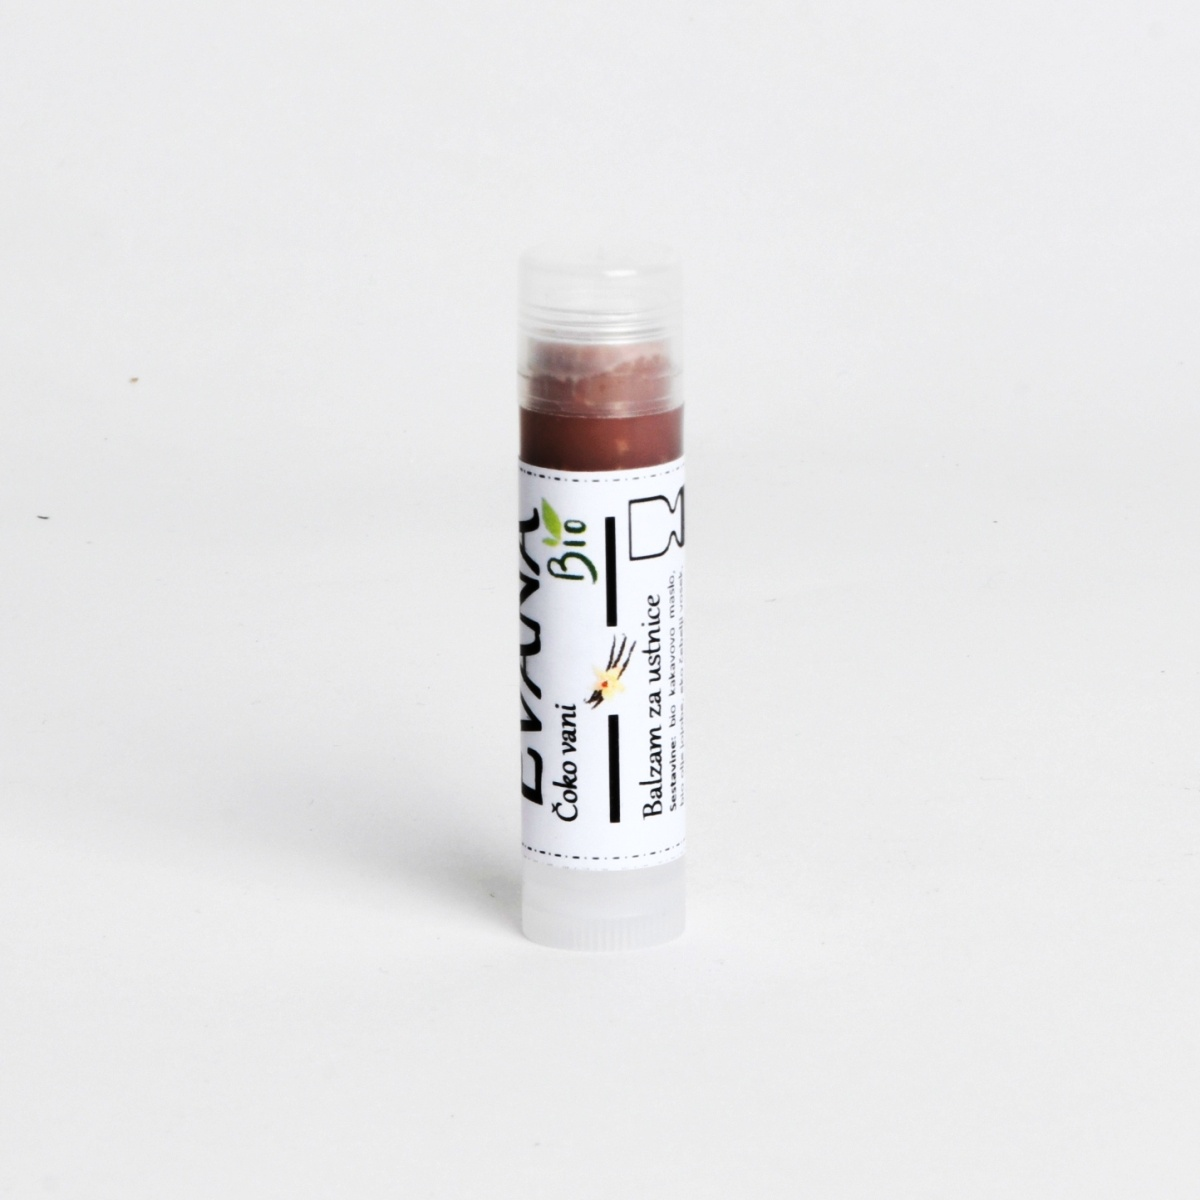 BIO balzam za ustnice 03 01 03 005